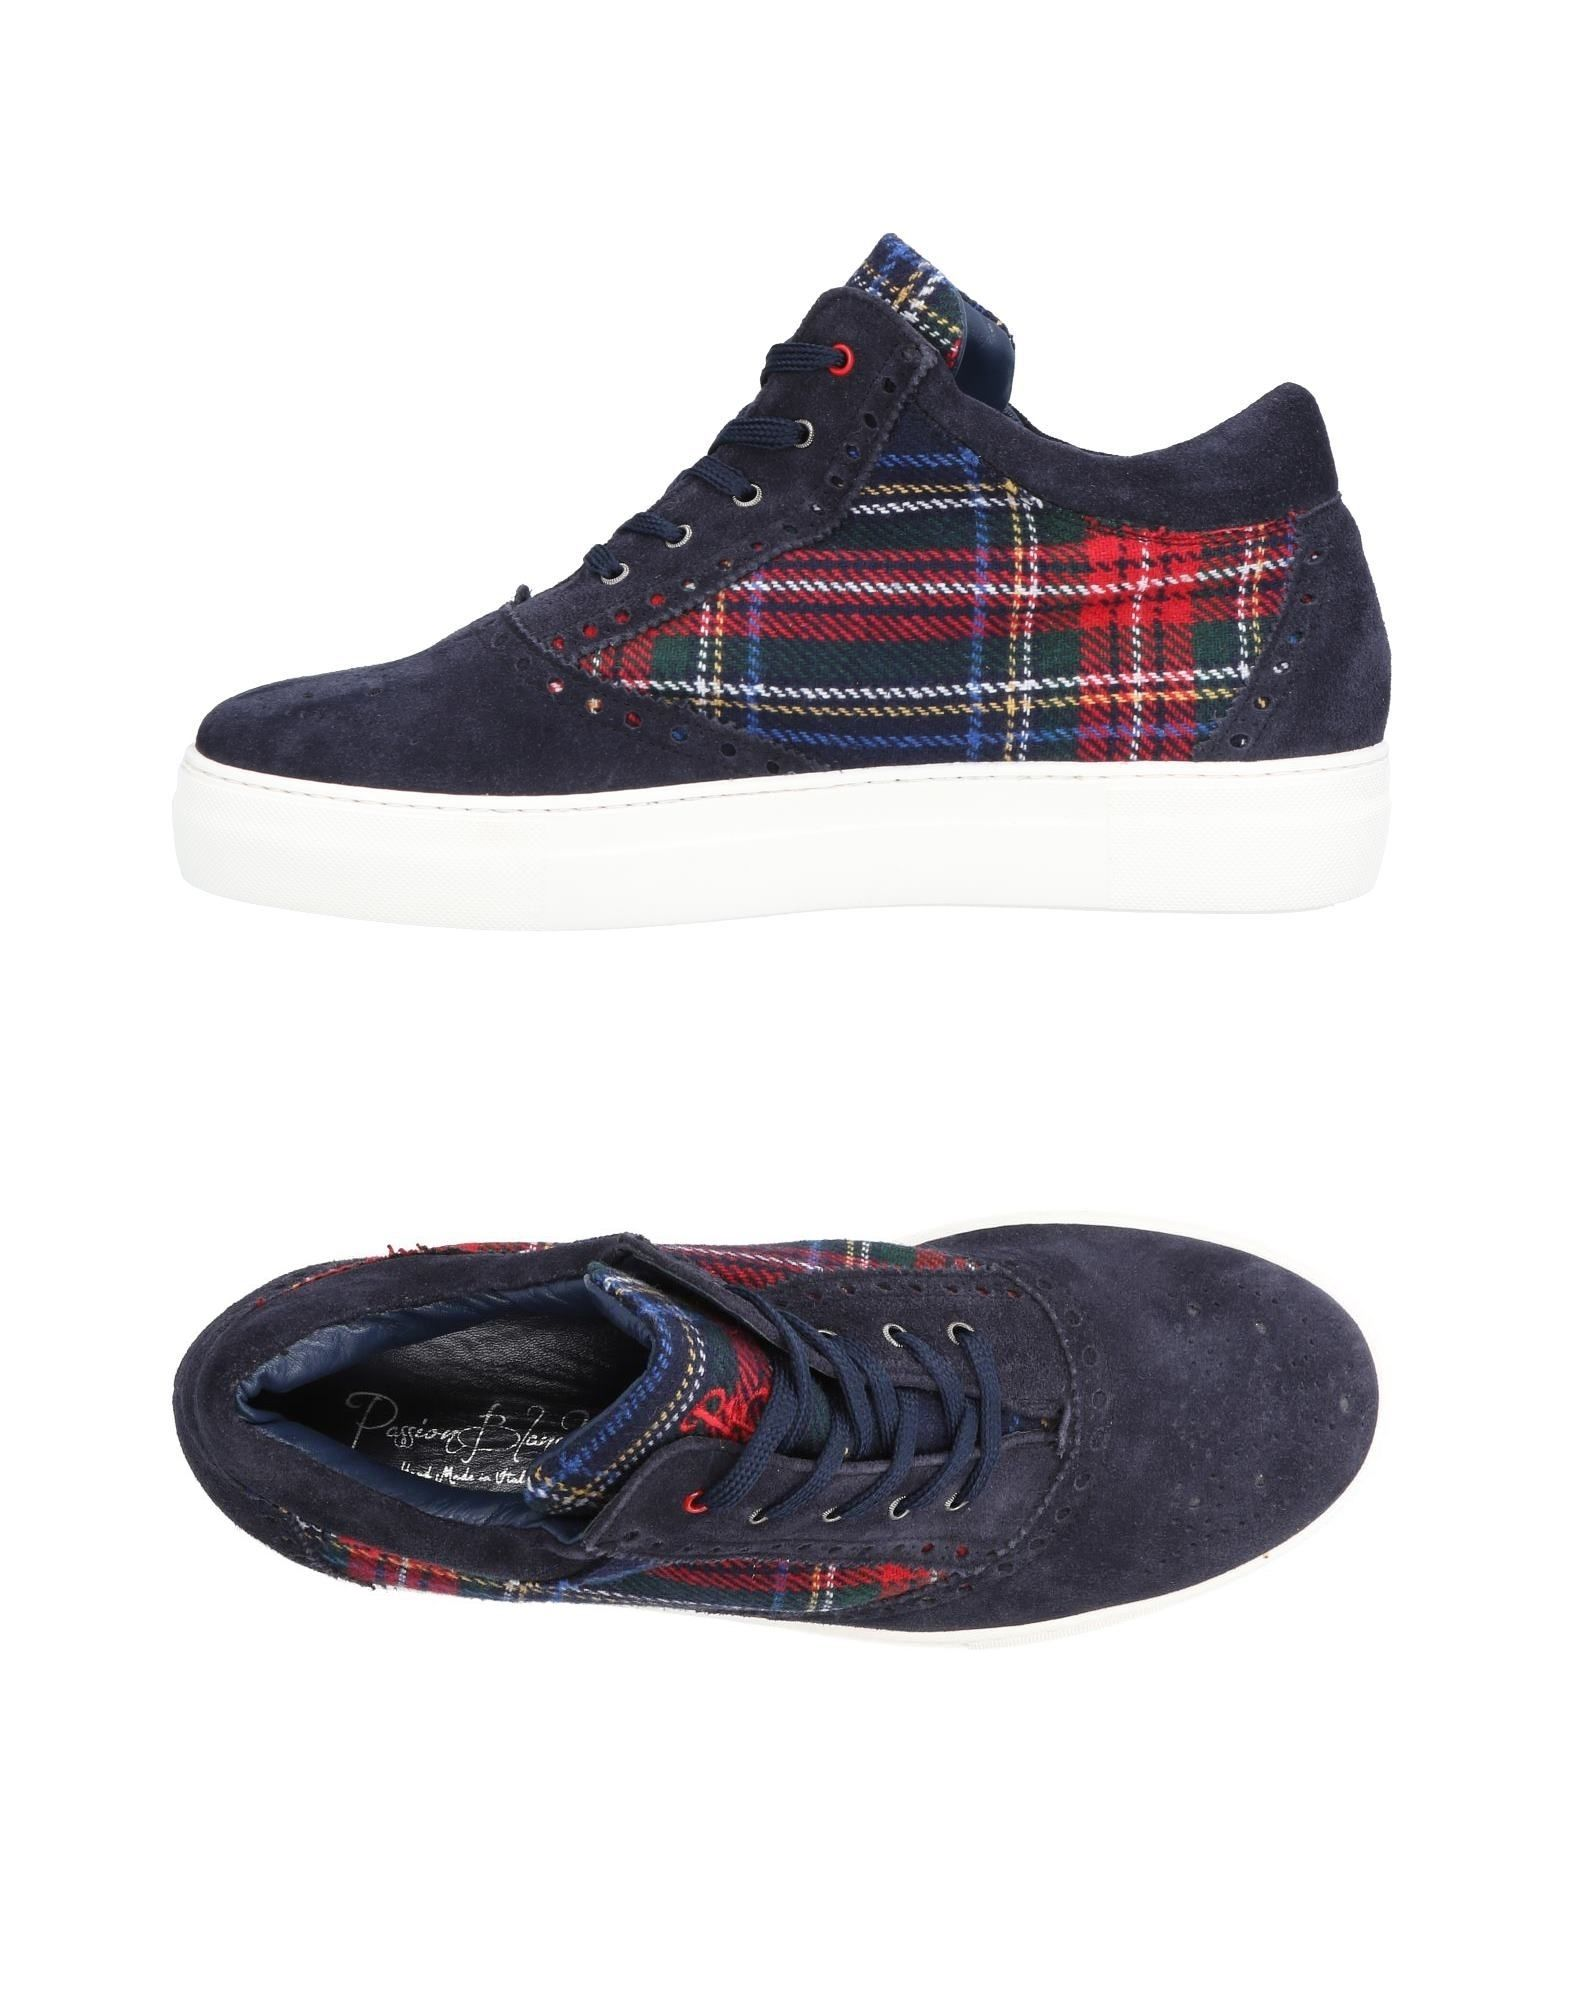 Rabatt echte Schuhe Schuhe Schuhe Passion Blanche Sneakers Herren  11495983QN af42a4